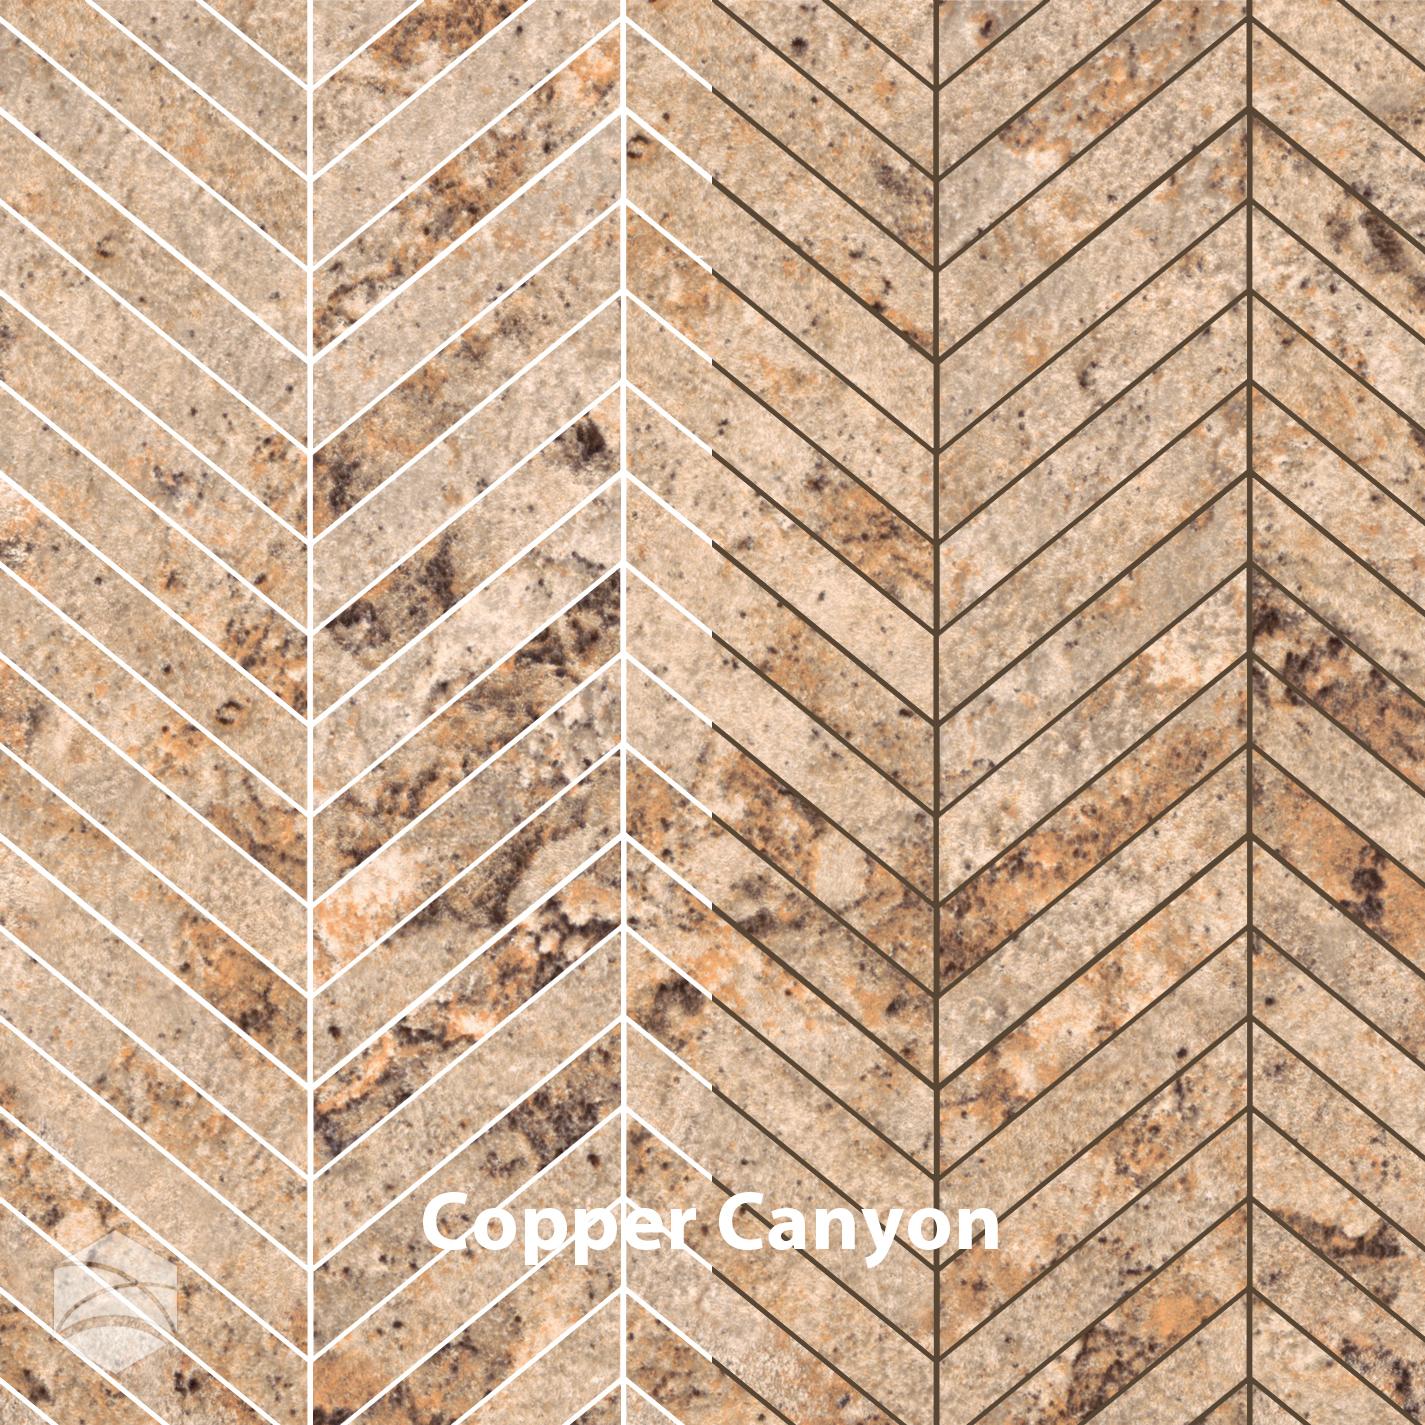 Copper Canyon_Chevron_V2_14x14.jpg